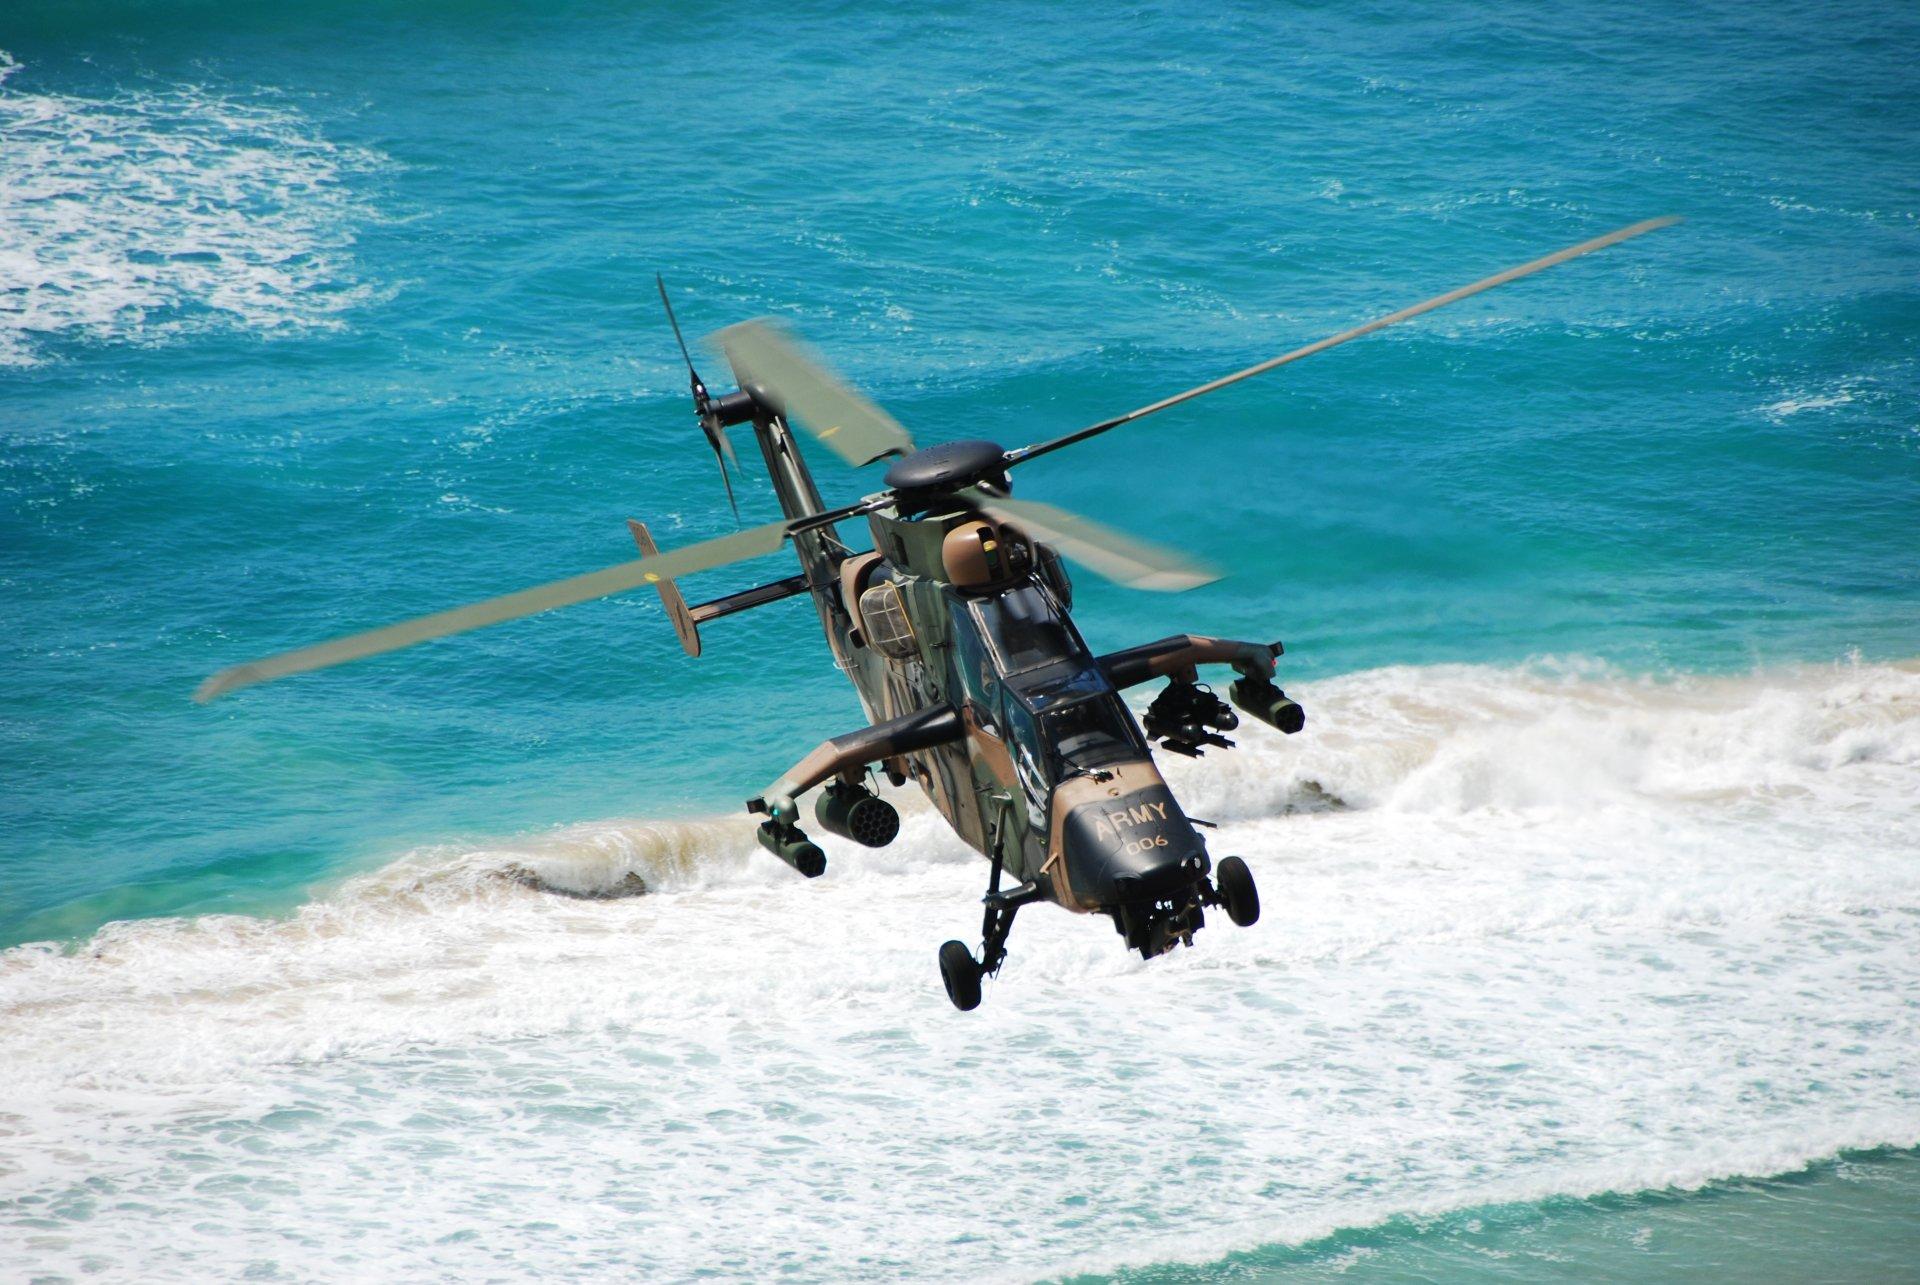 Military Helicopter 4k Hd Desktop Wallpaper For 4k Ultra: Eurocopter Tiger 4k Ultra HD Wallpaper